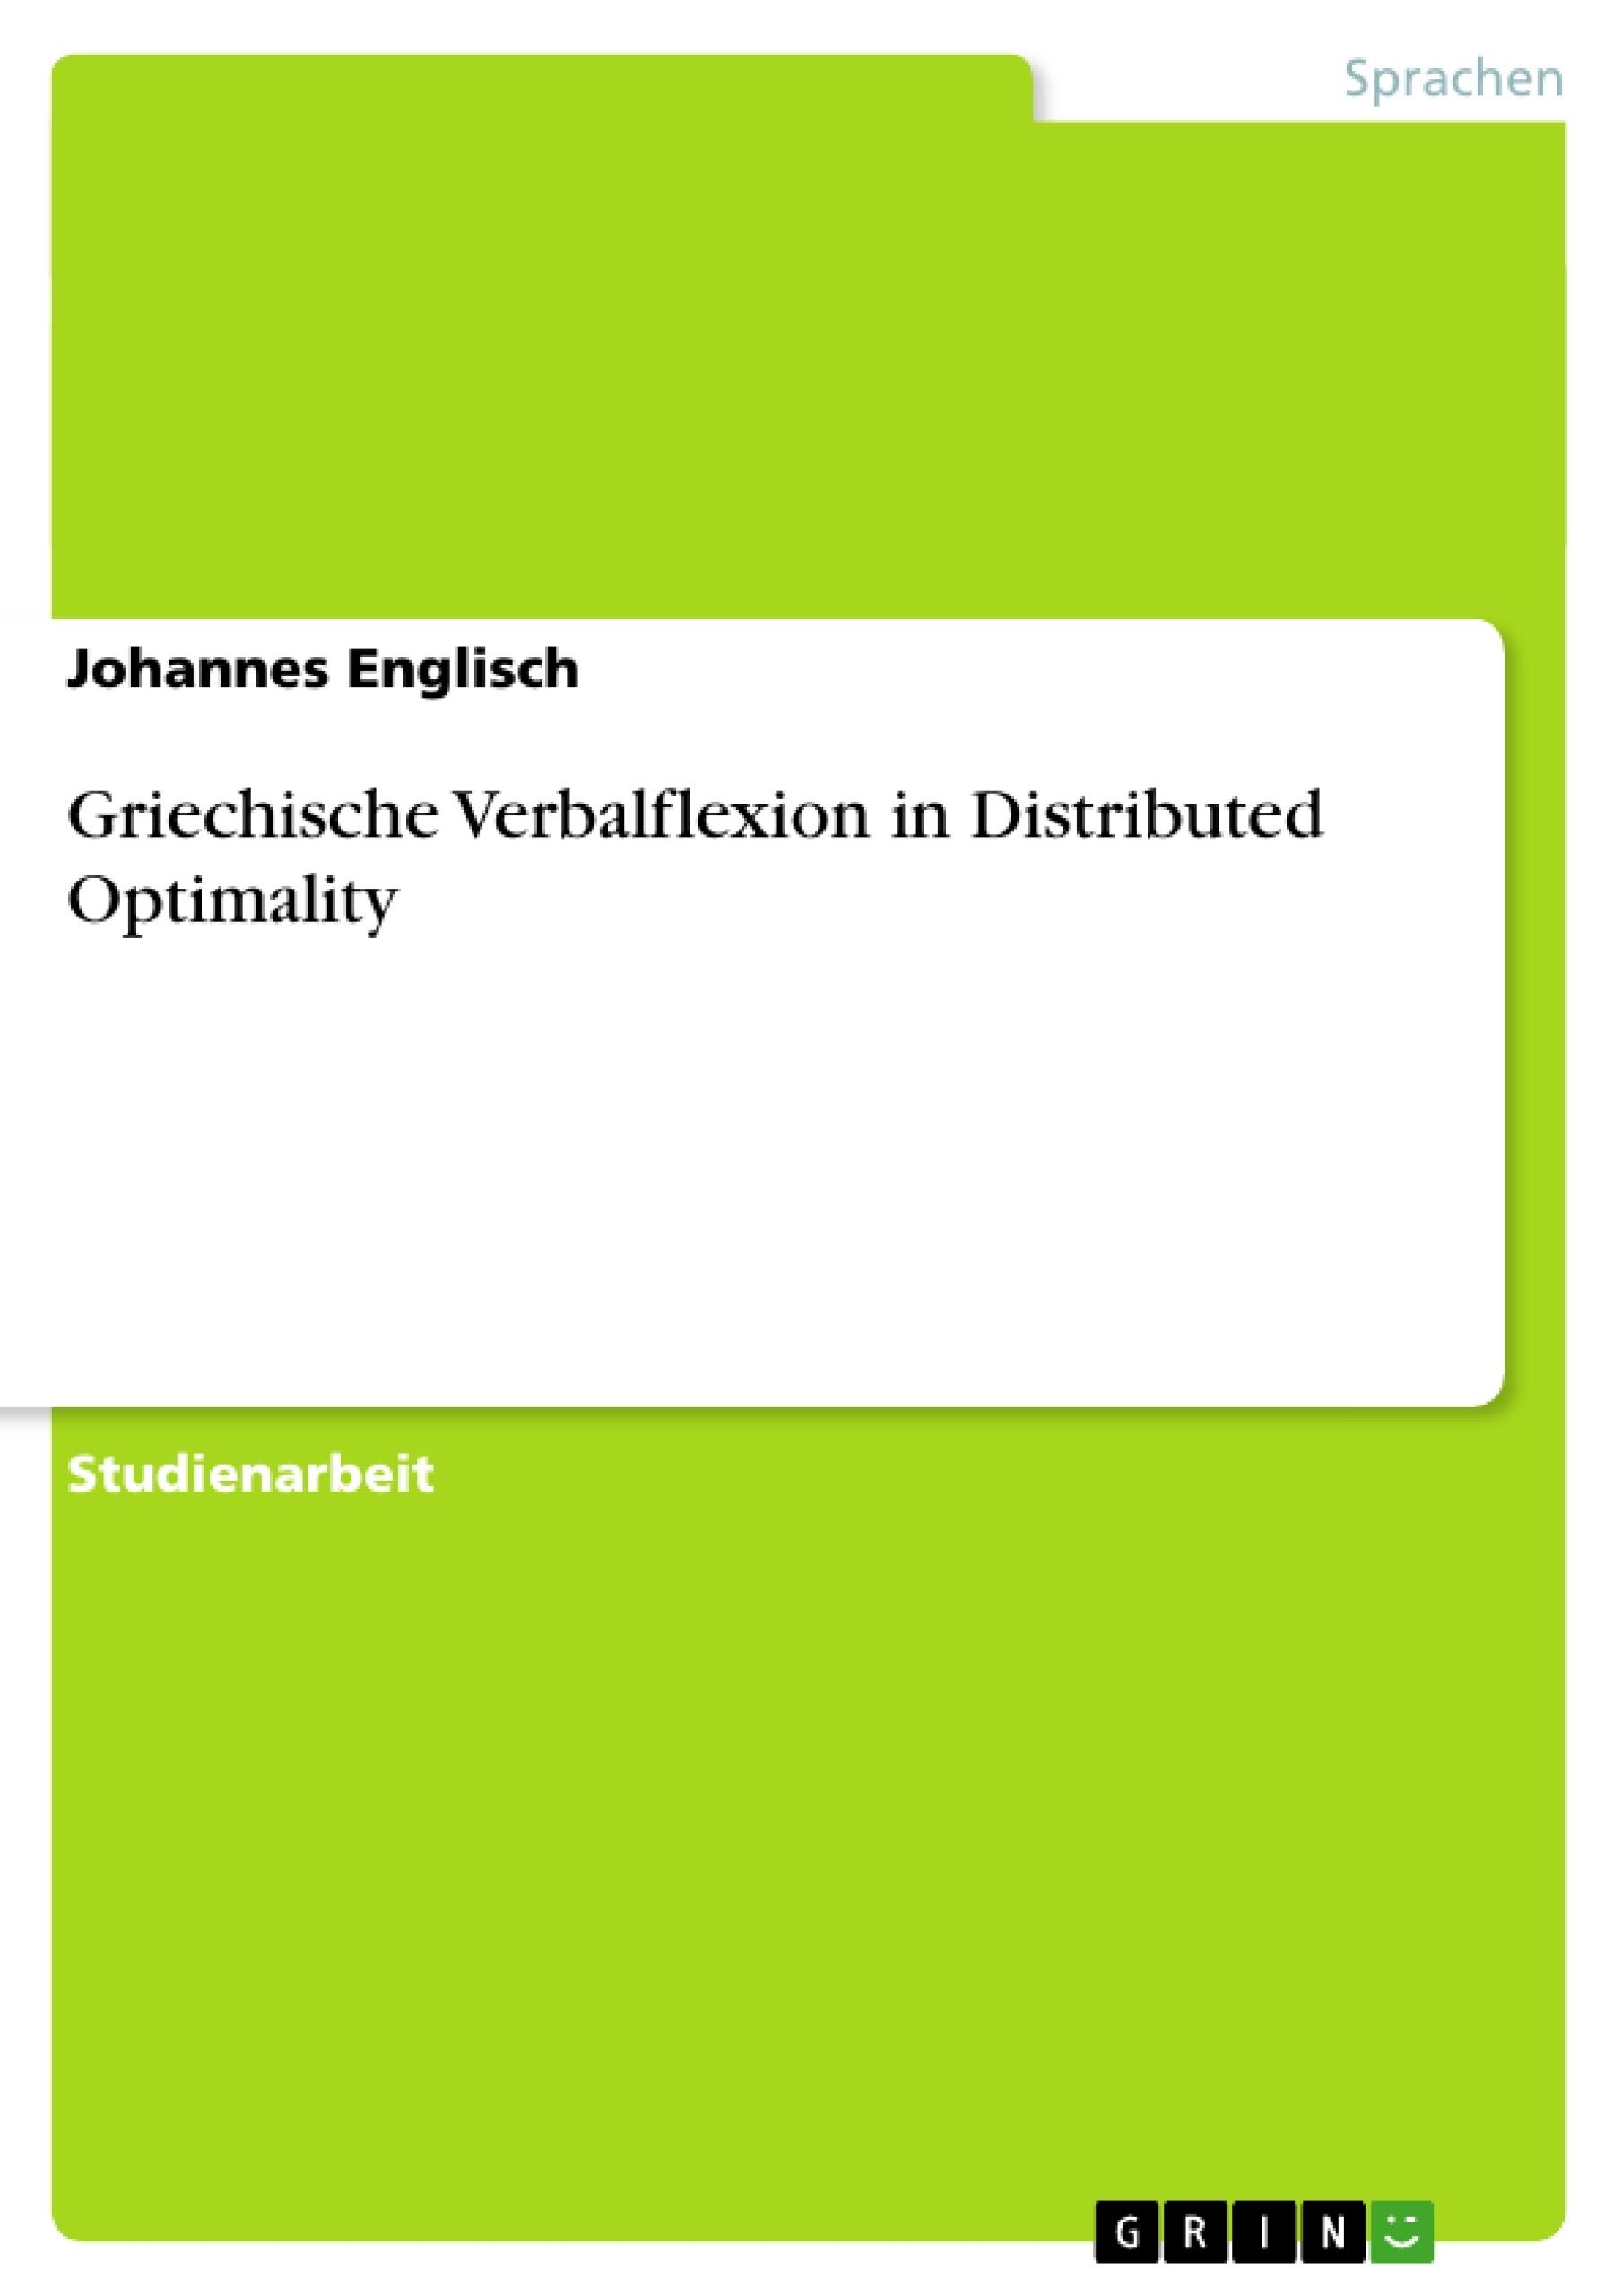 Titel: Griechische Verbalflexion in Distributed Optimality